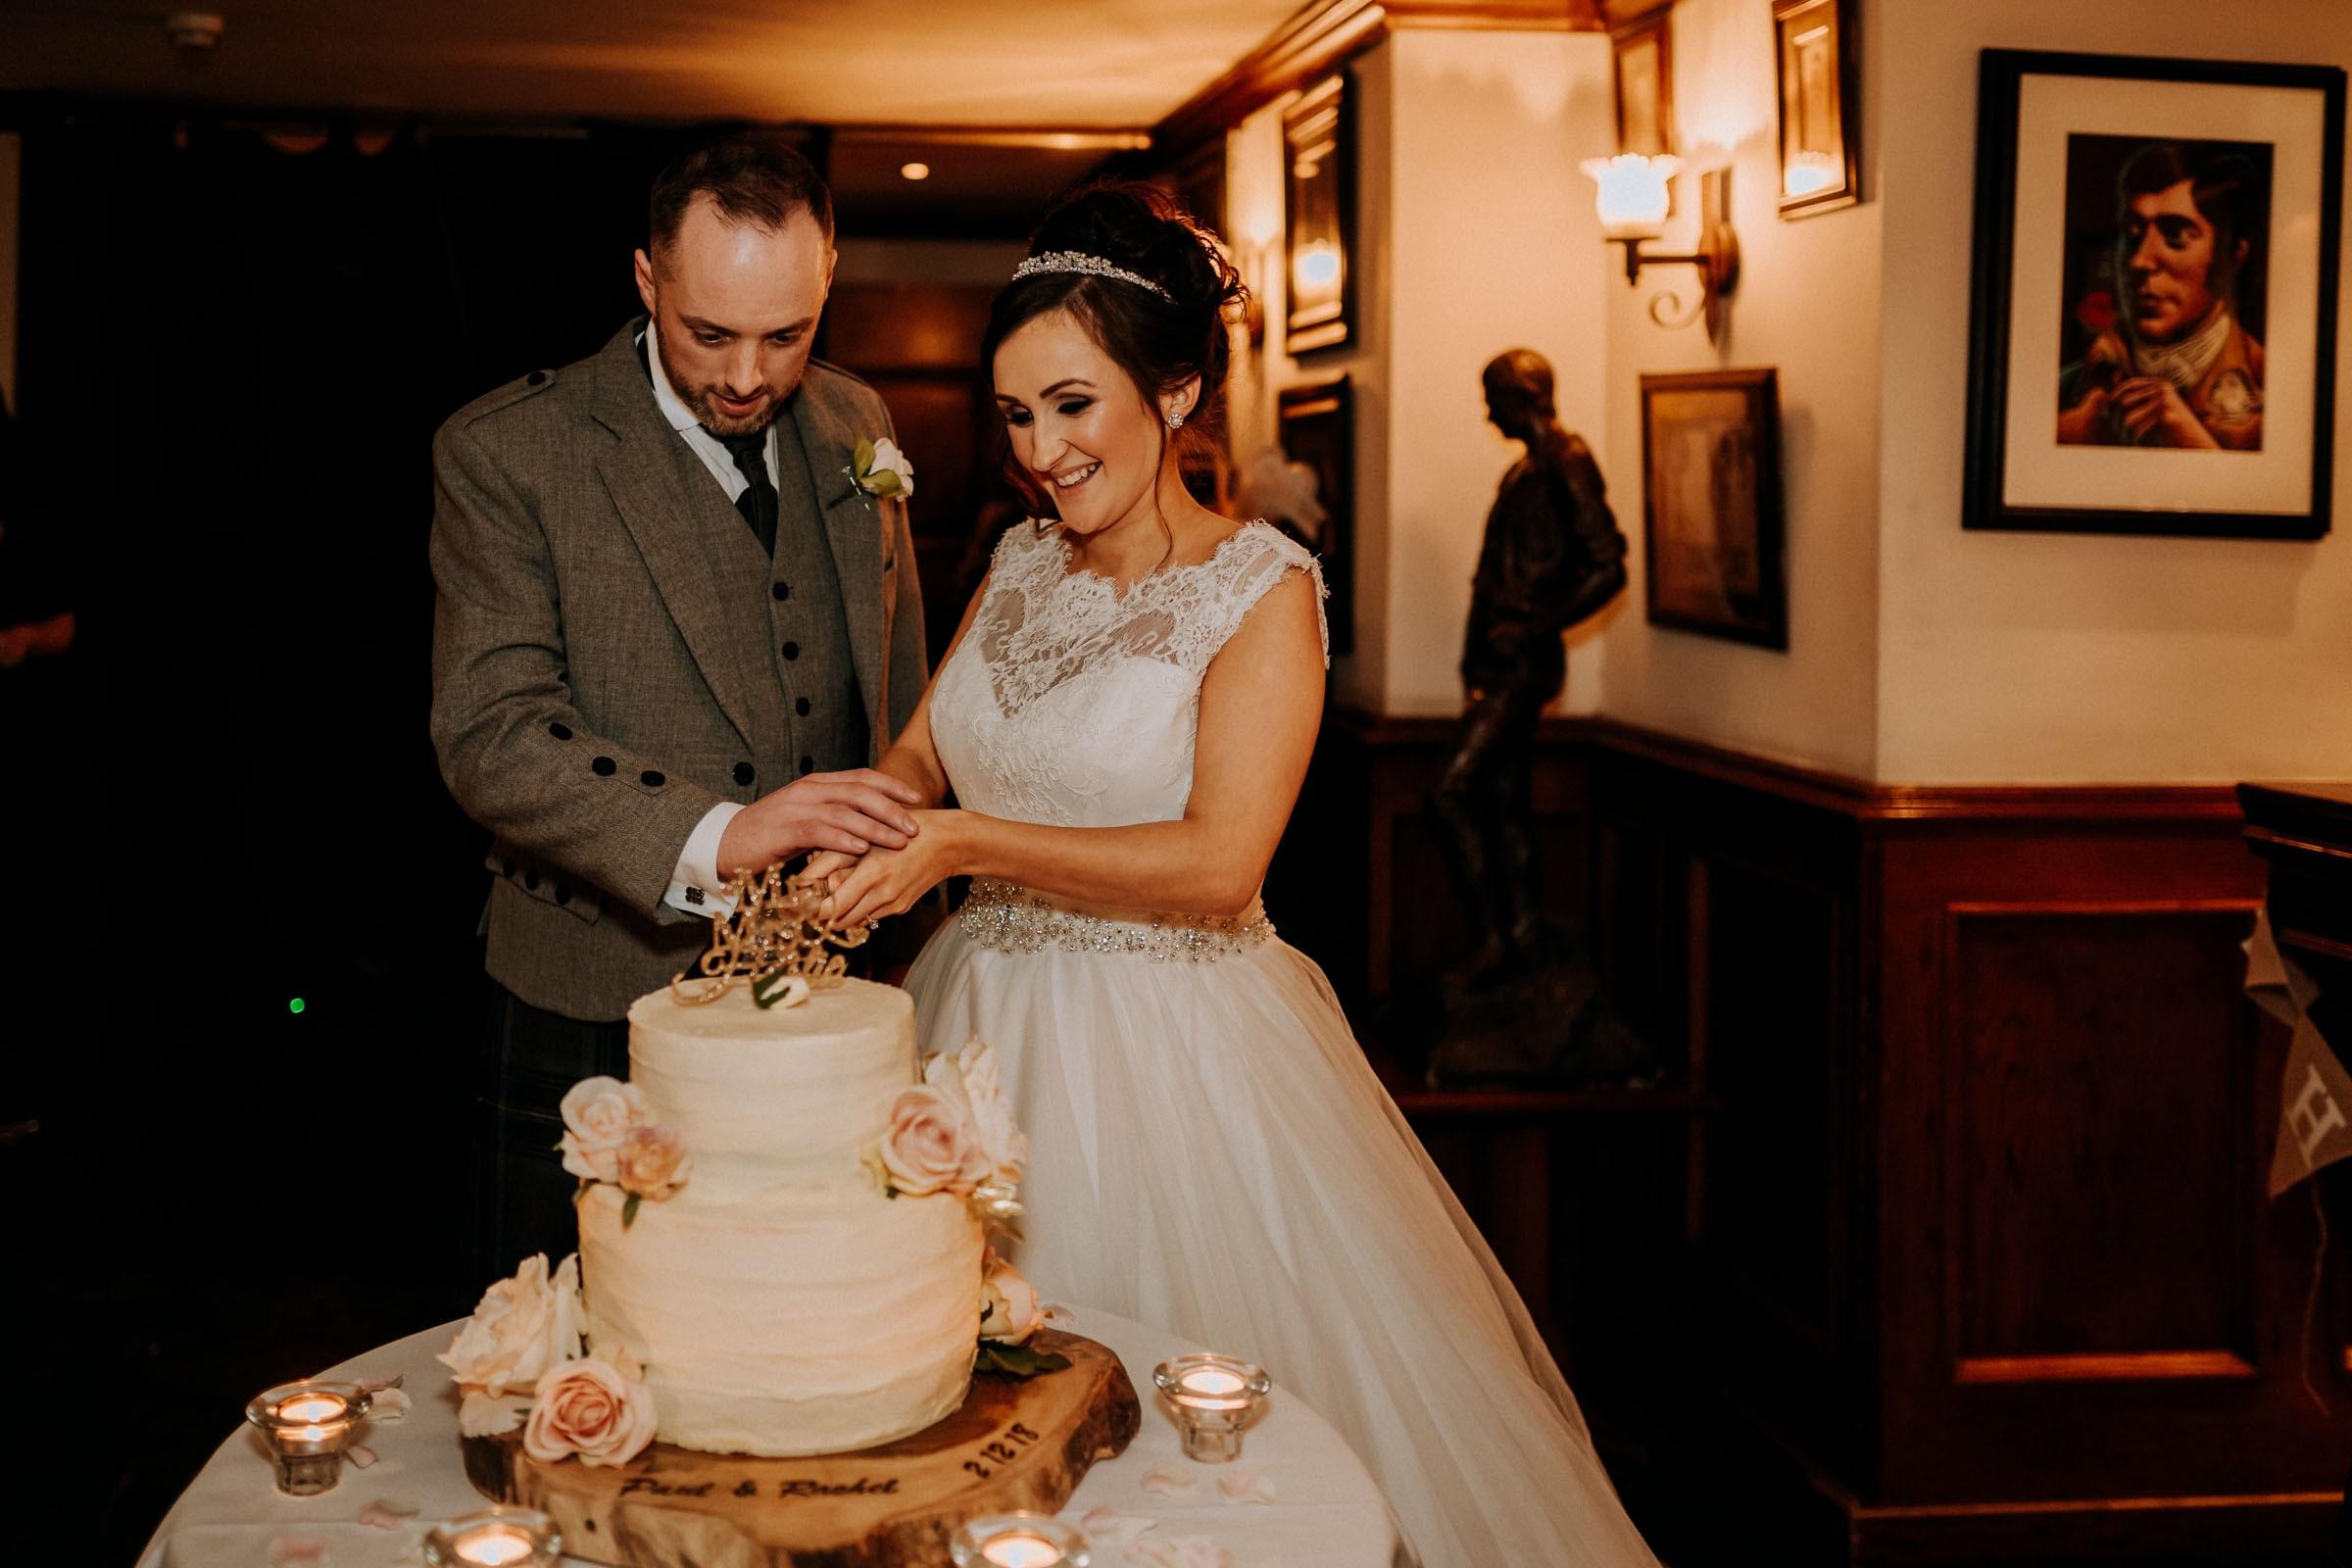 Oran-Mor-Wedding-Photographer-DearlyPhotography (44 of 55).jpg